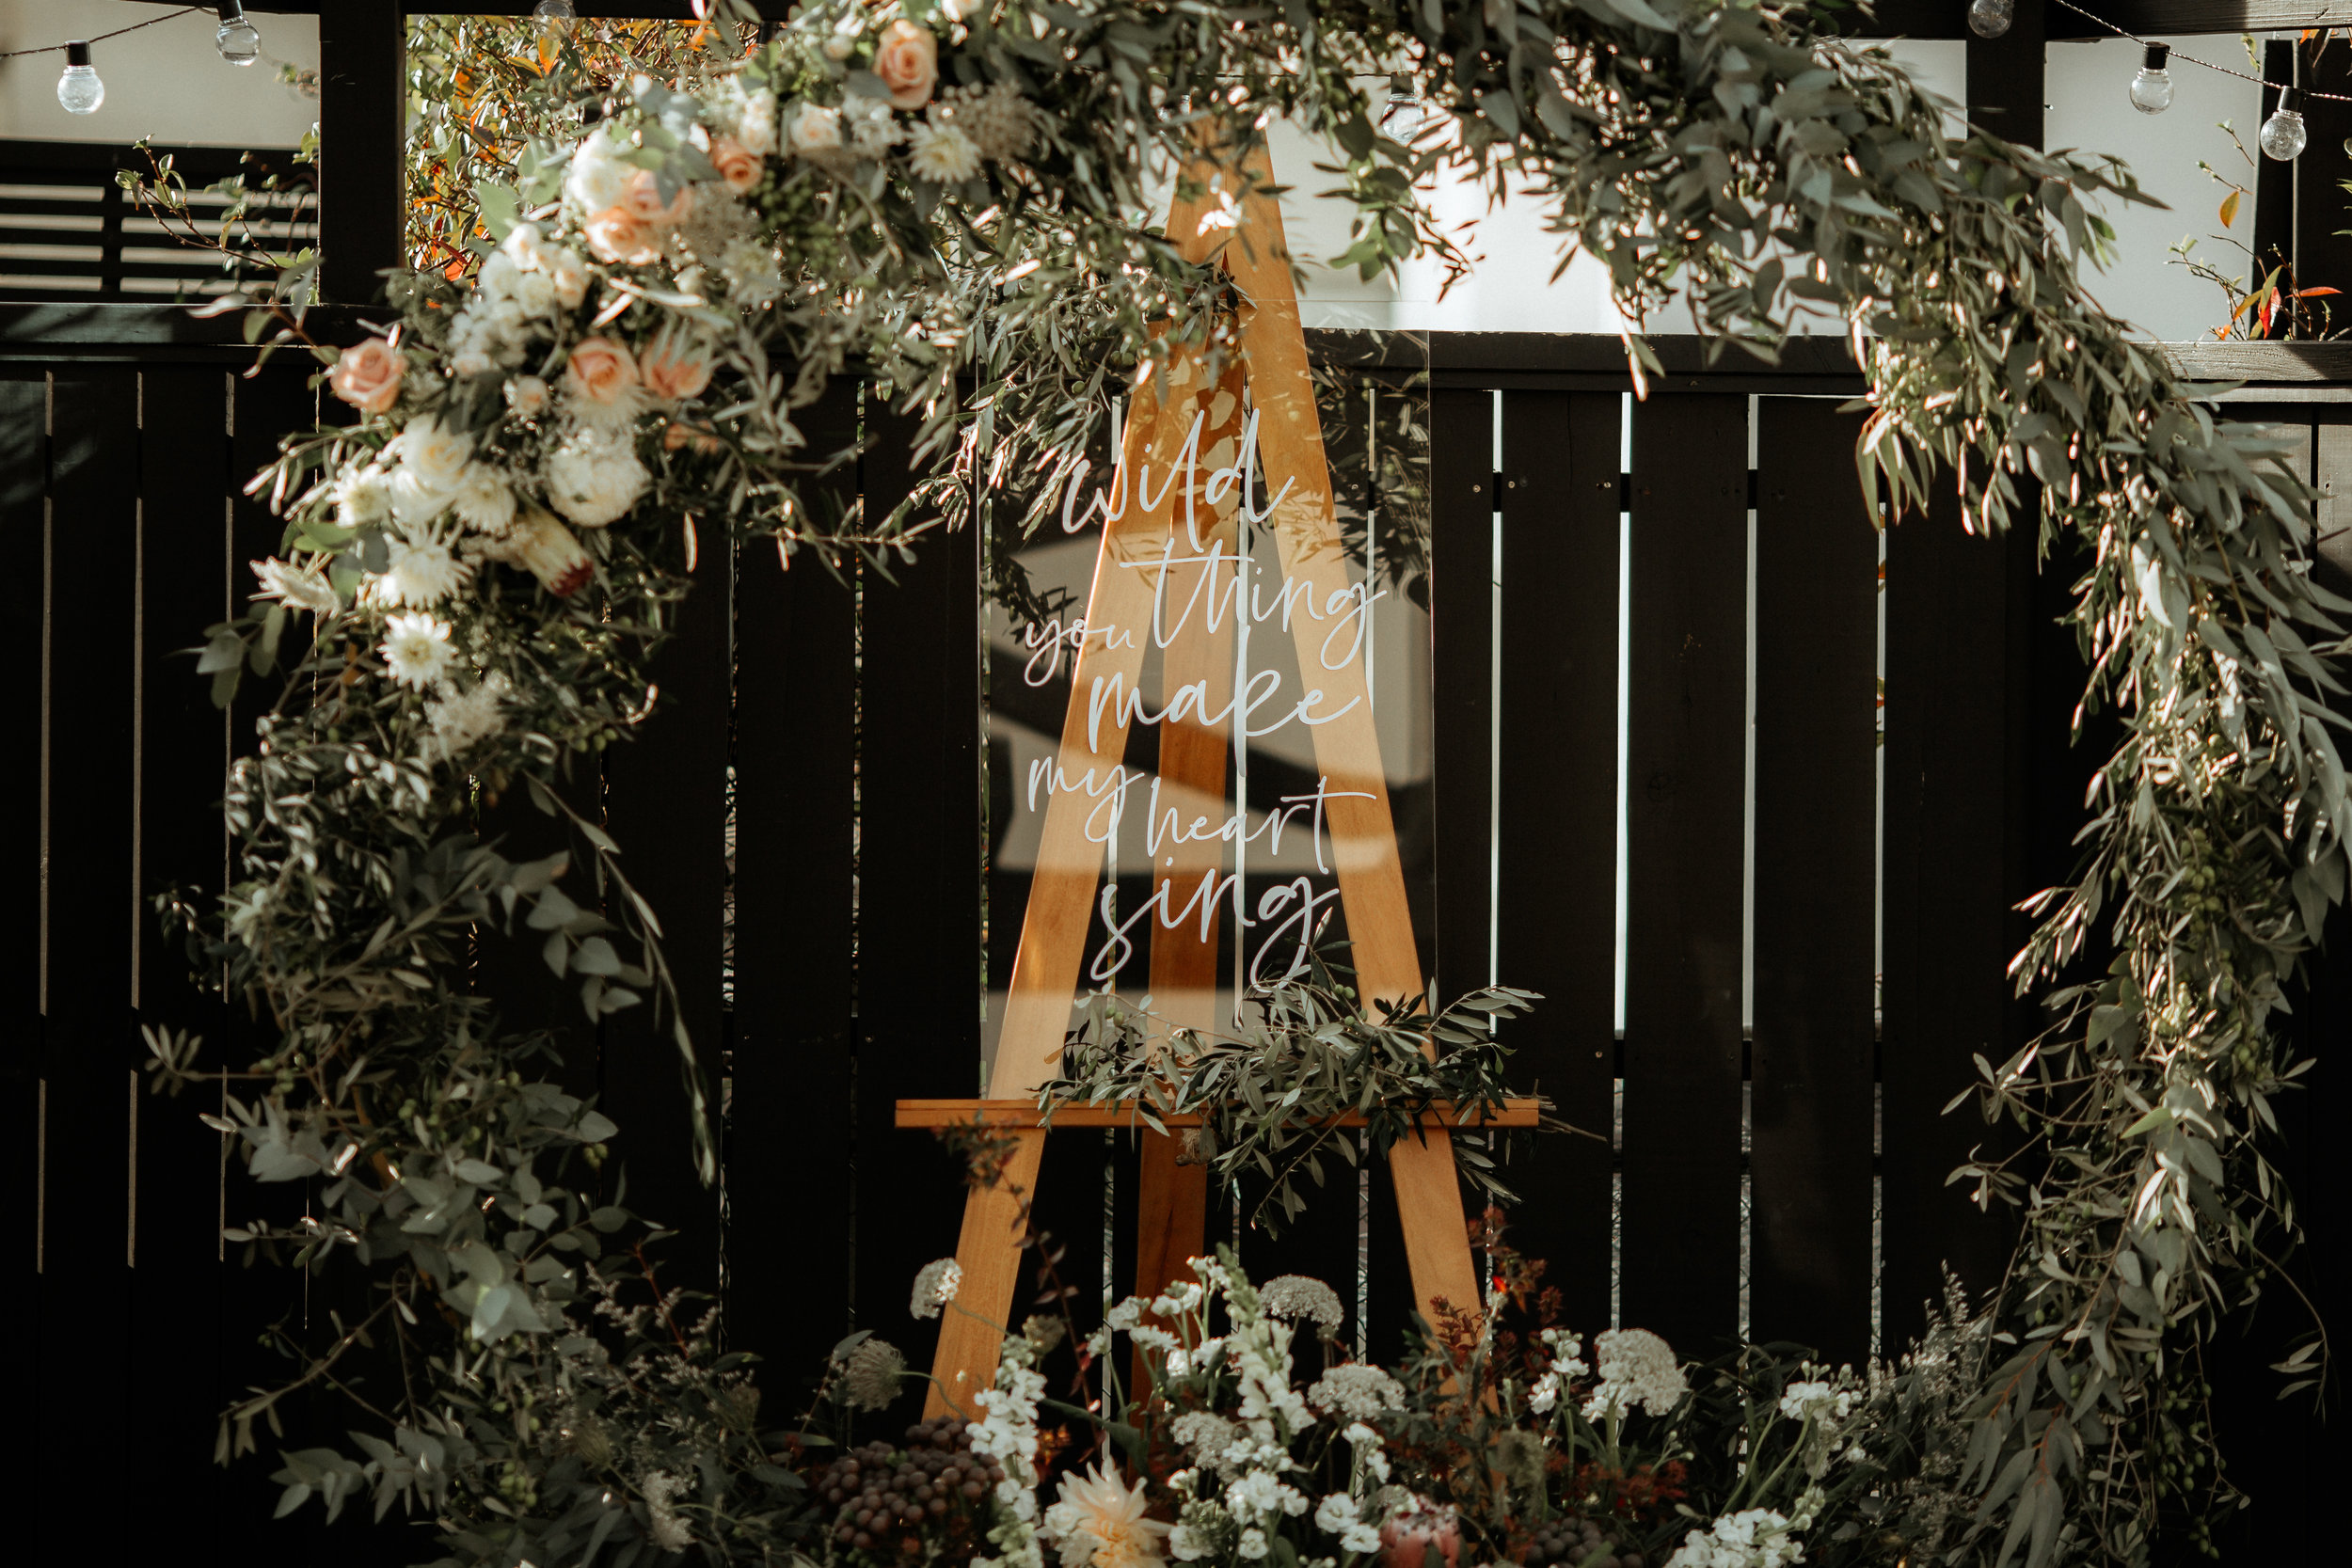 zandaphotography_Boheme_events_wedding_Auckland-139.jpg